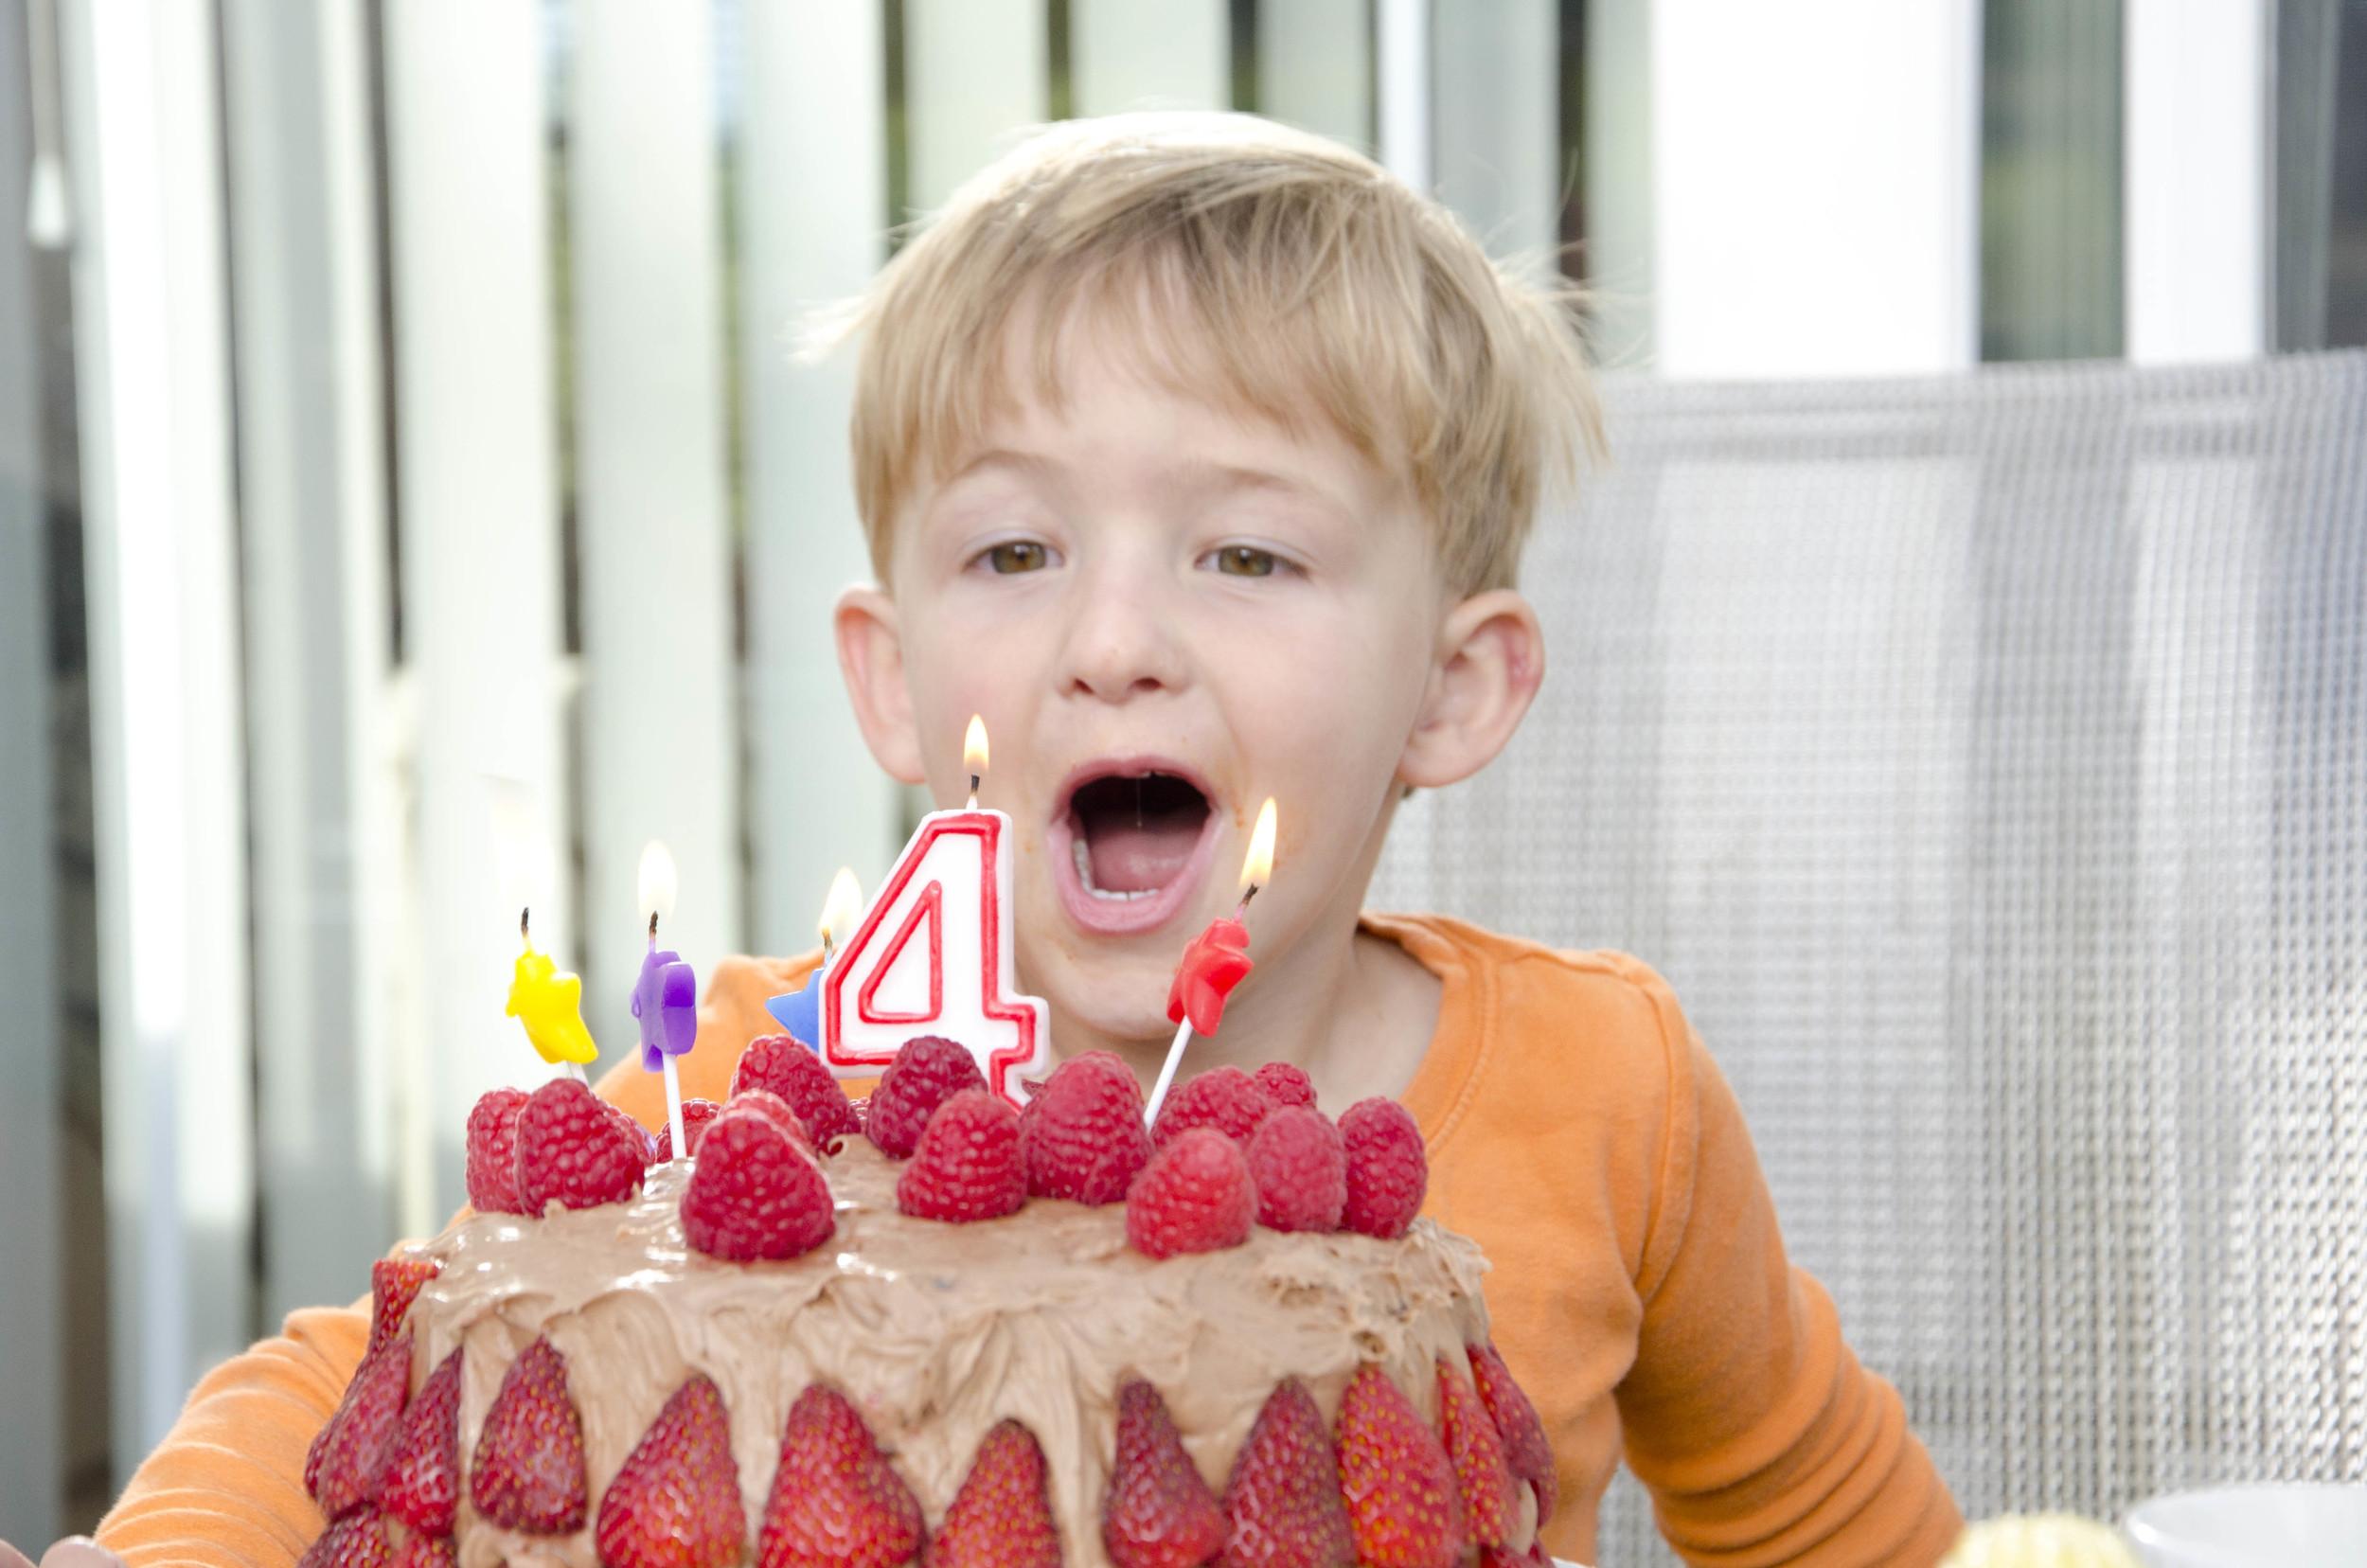 Day 11: Happy birthday, Bear!